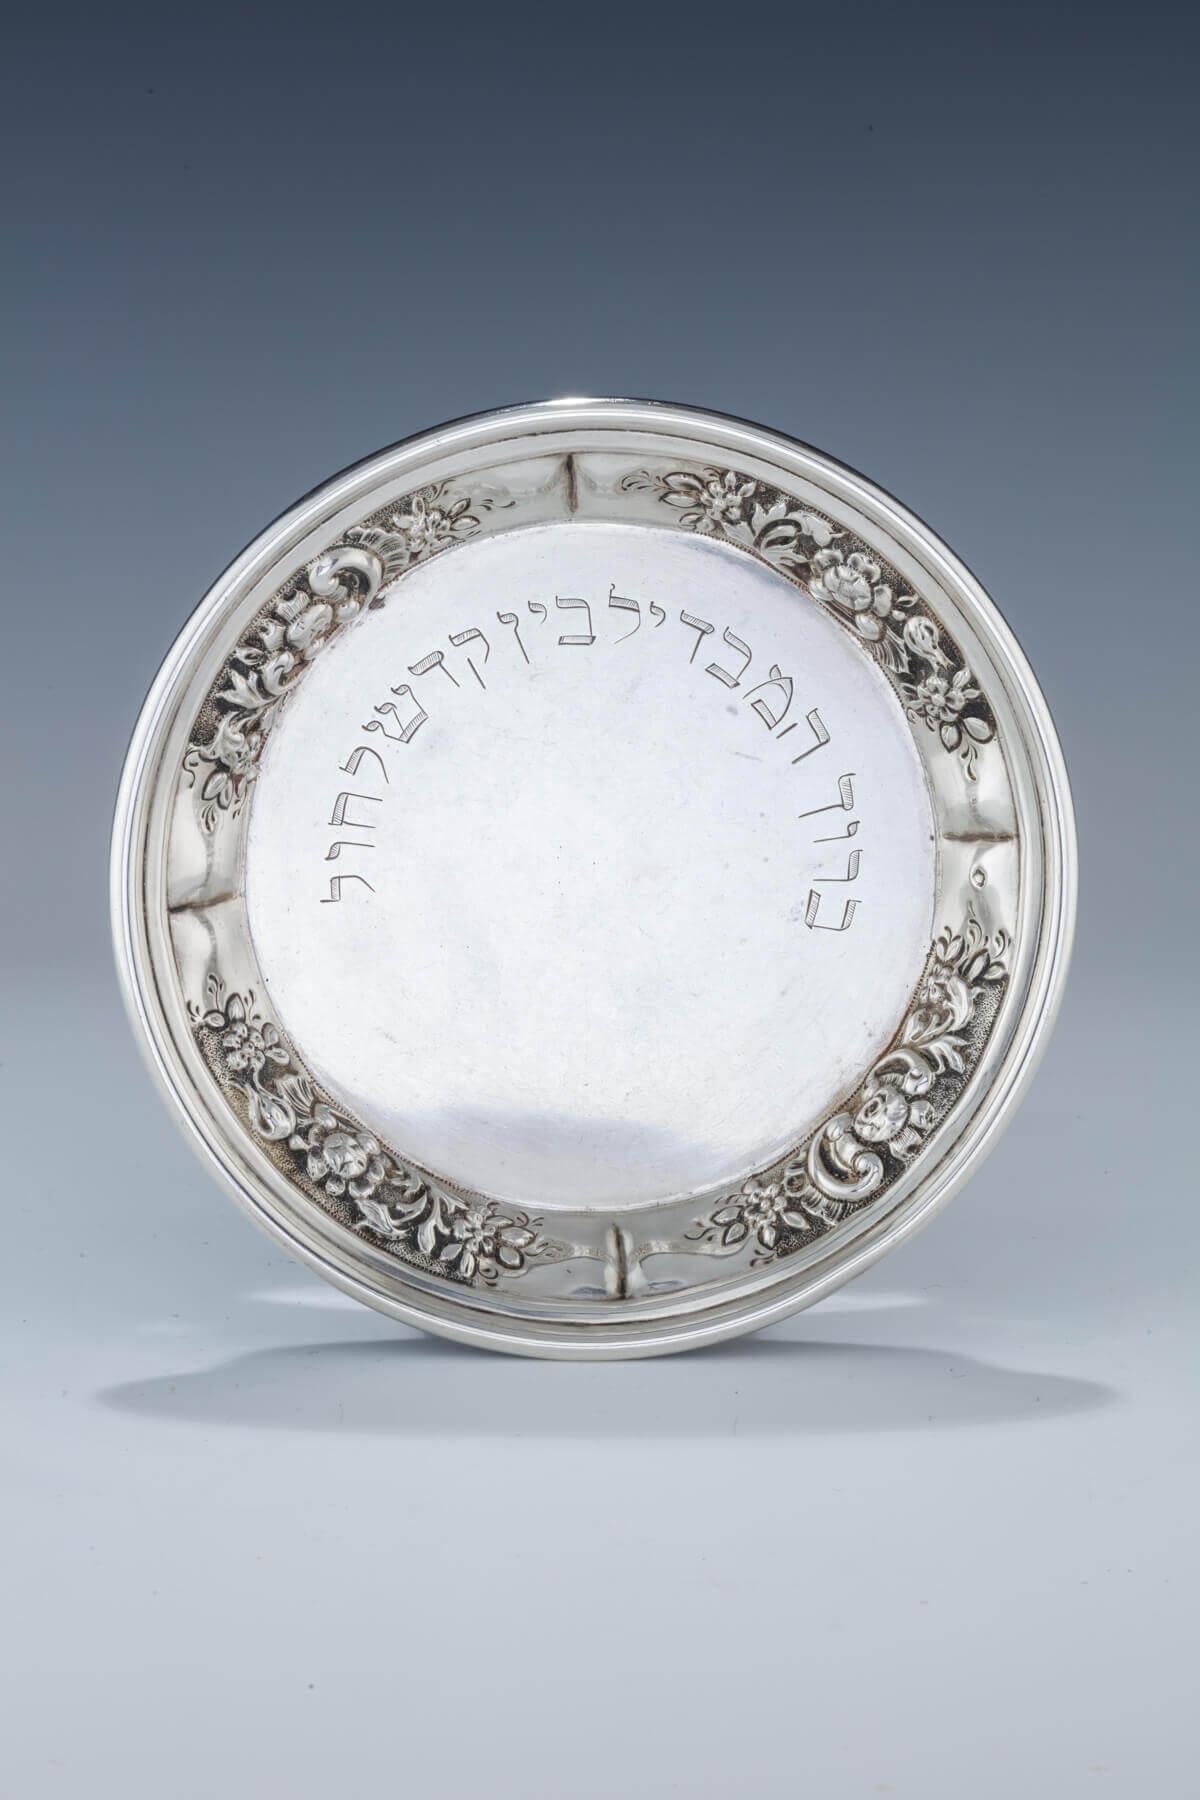 092. A SILVER HAVDALAH PLATE